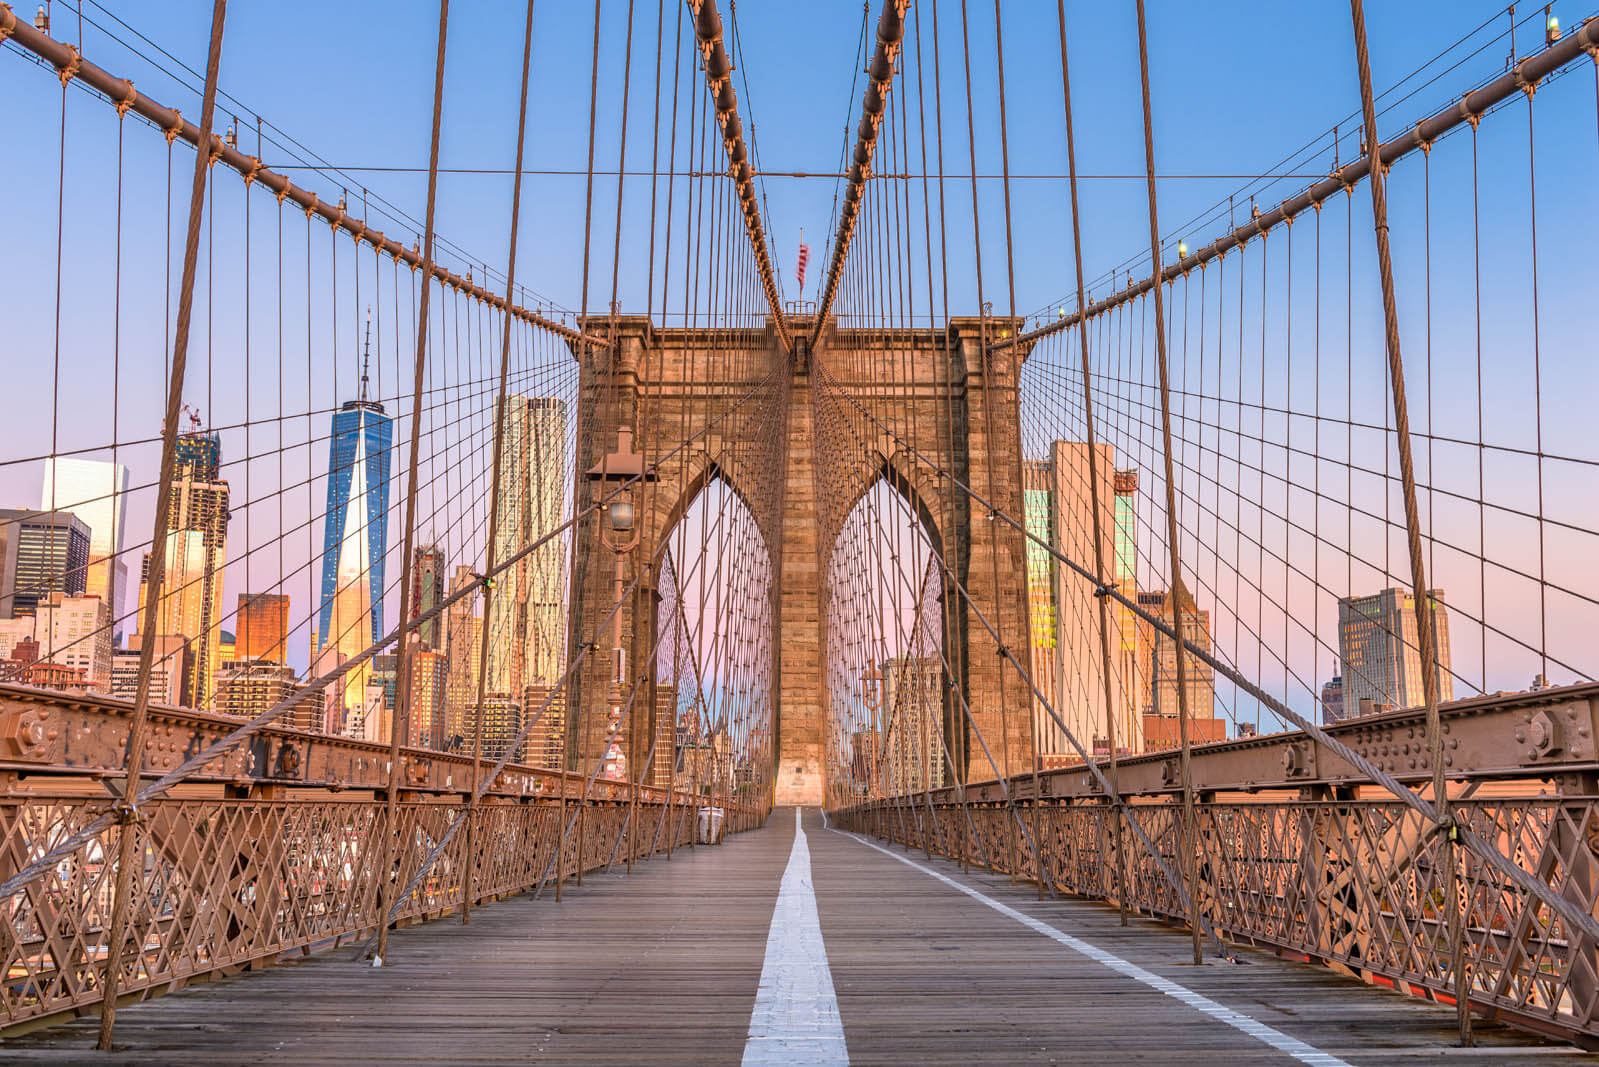 Brooklyn Bridge Promenade with the New York City skyline.